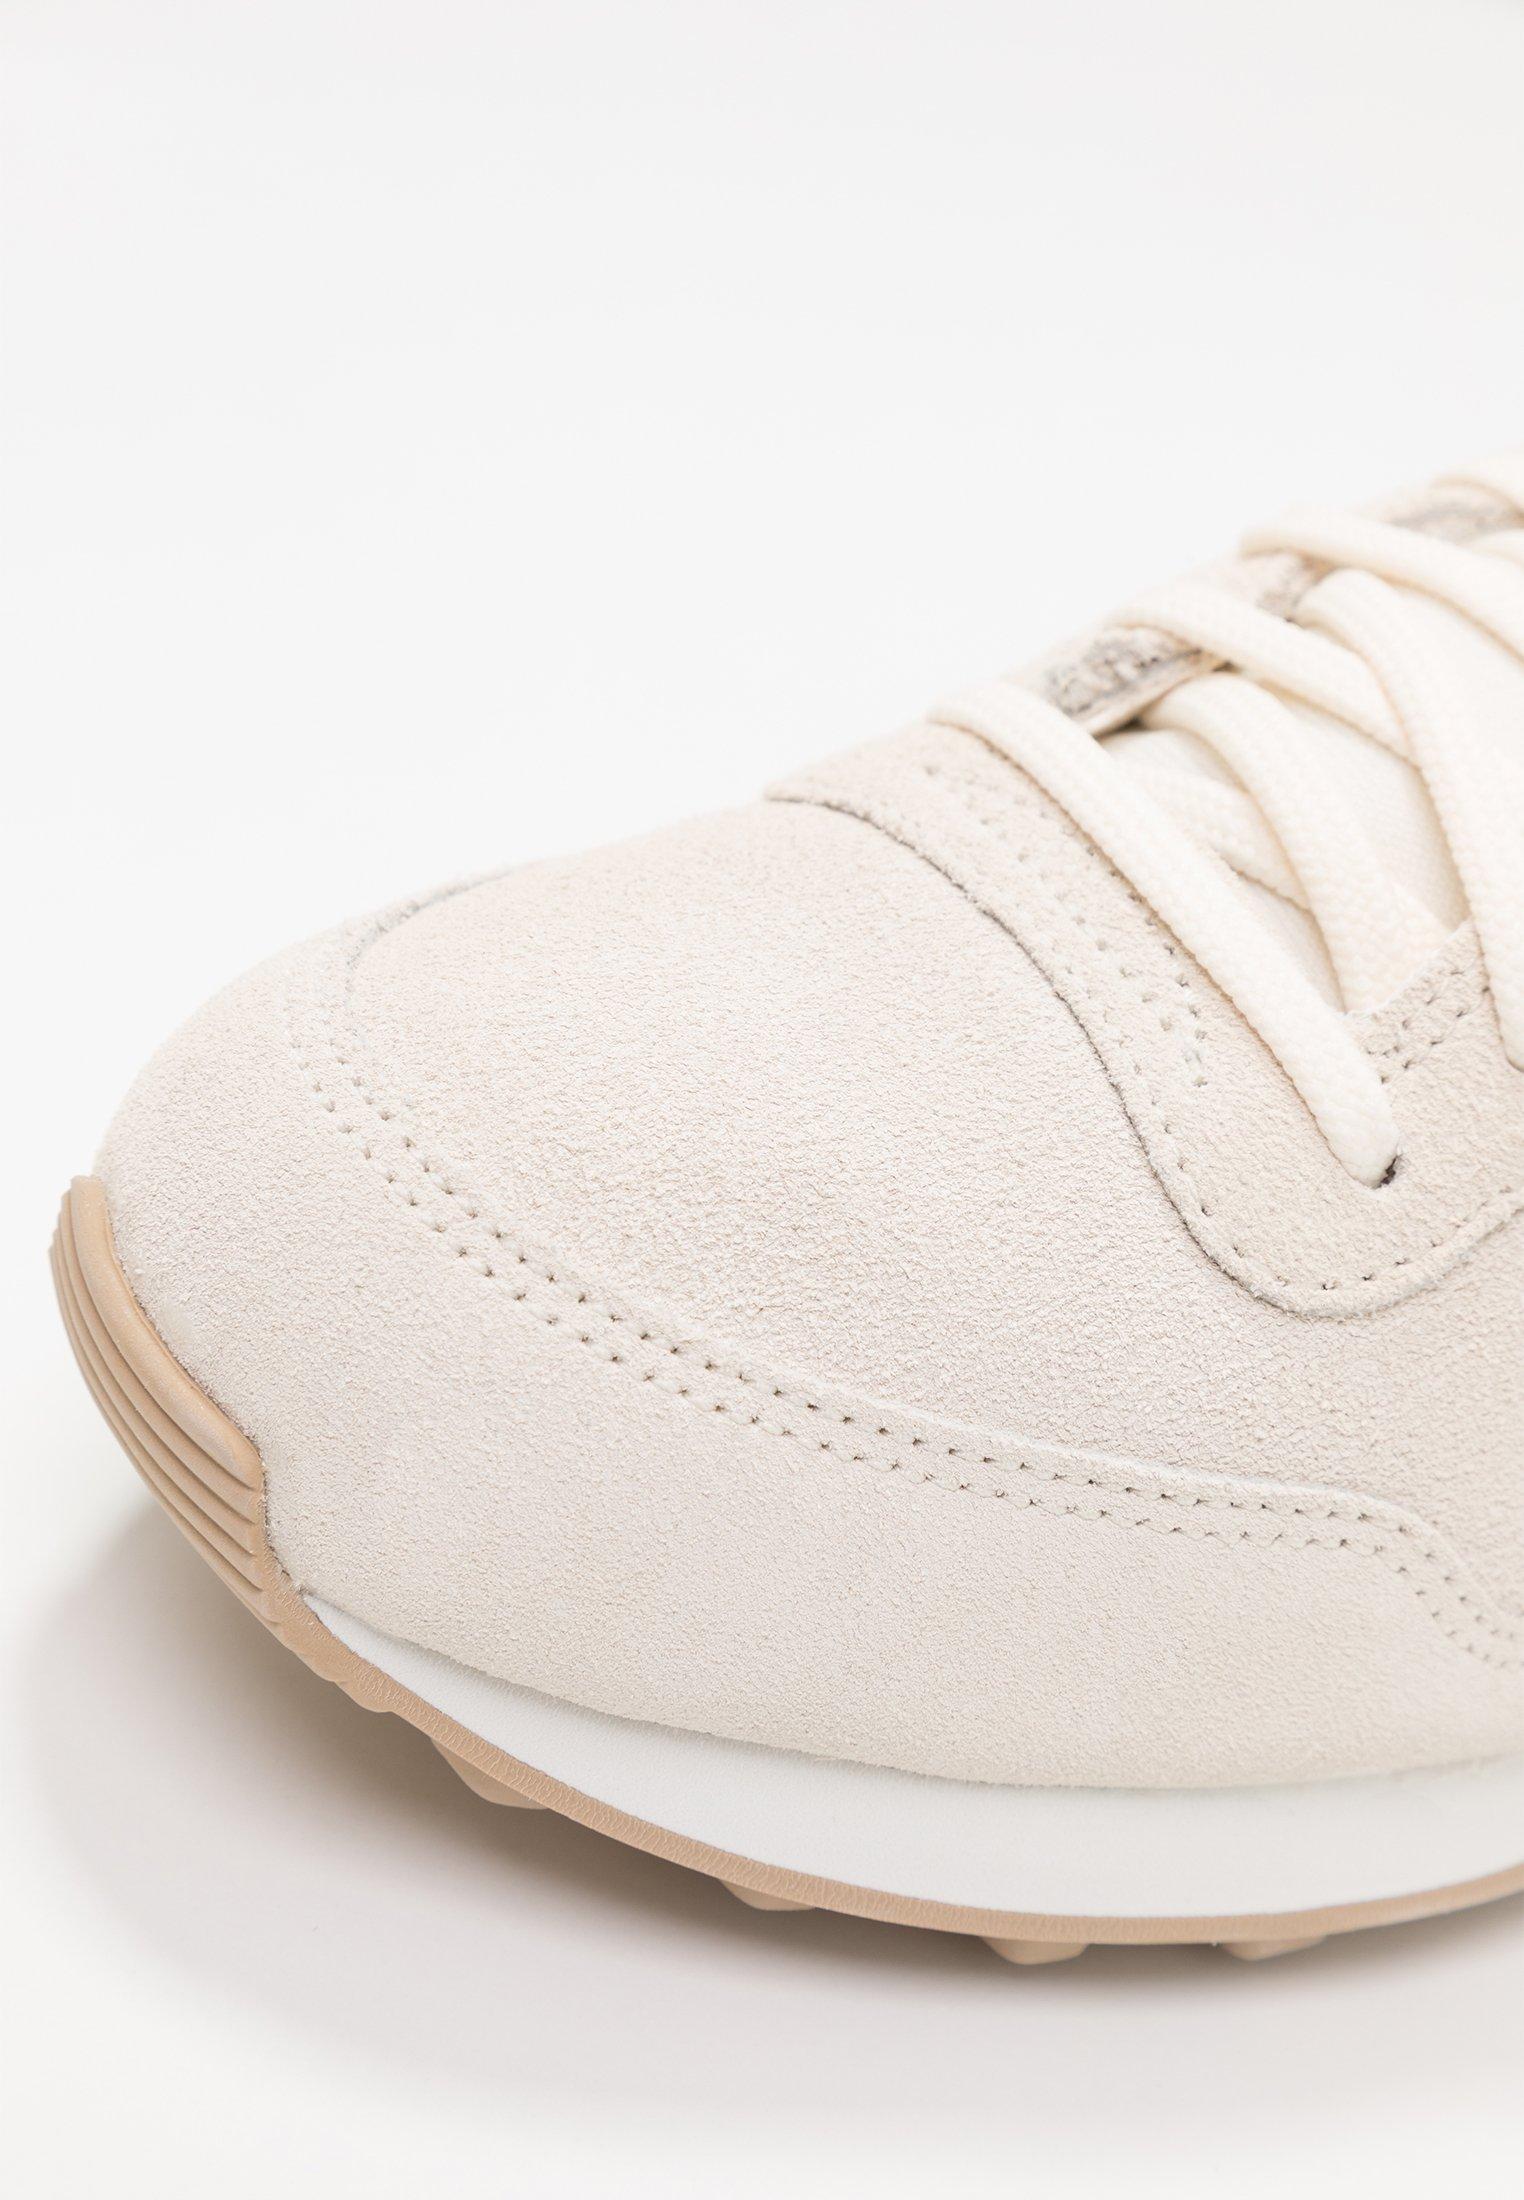 INTERNATIONALIST PRM Sneakers laag pale ivorysummit whitetan